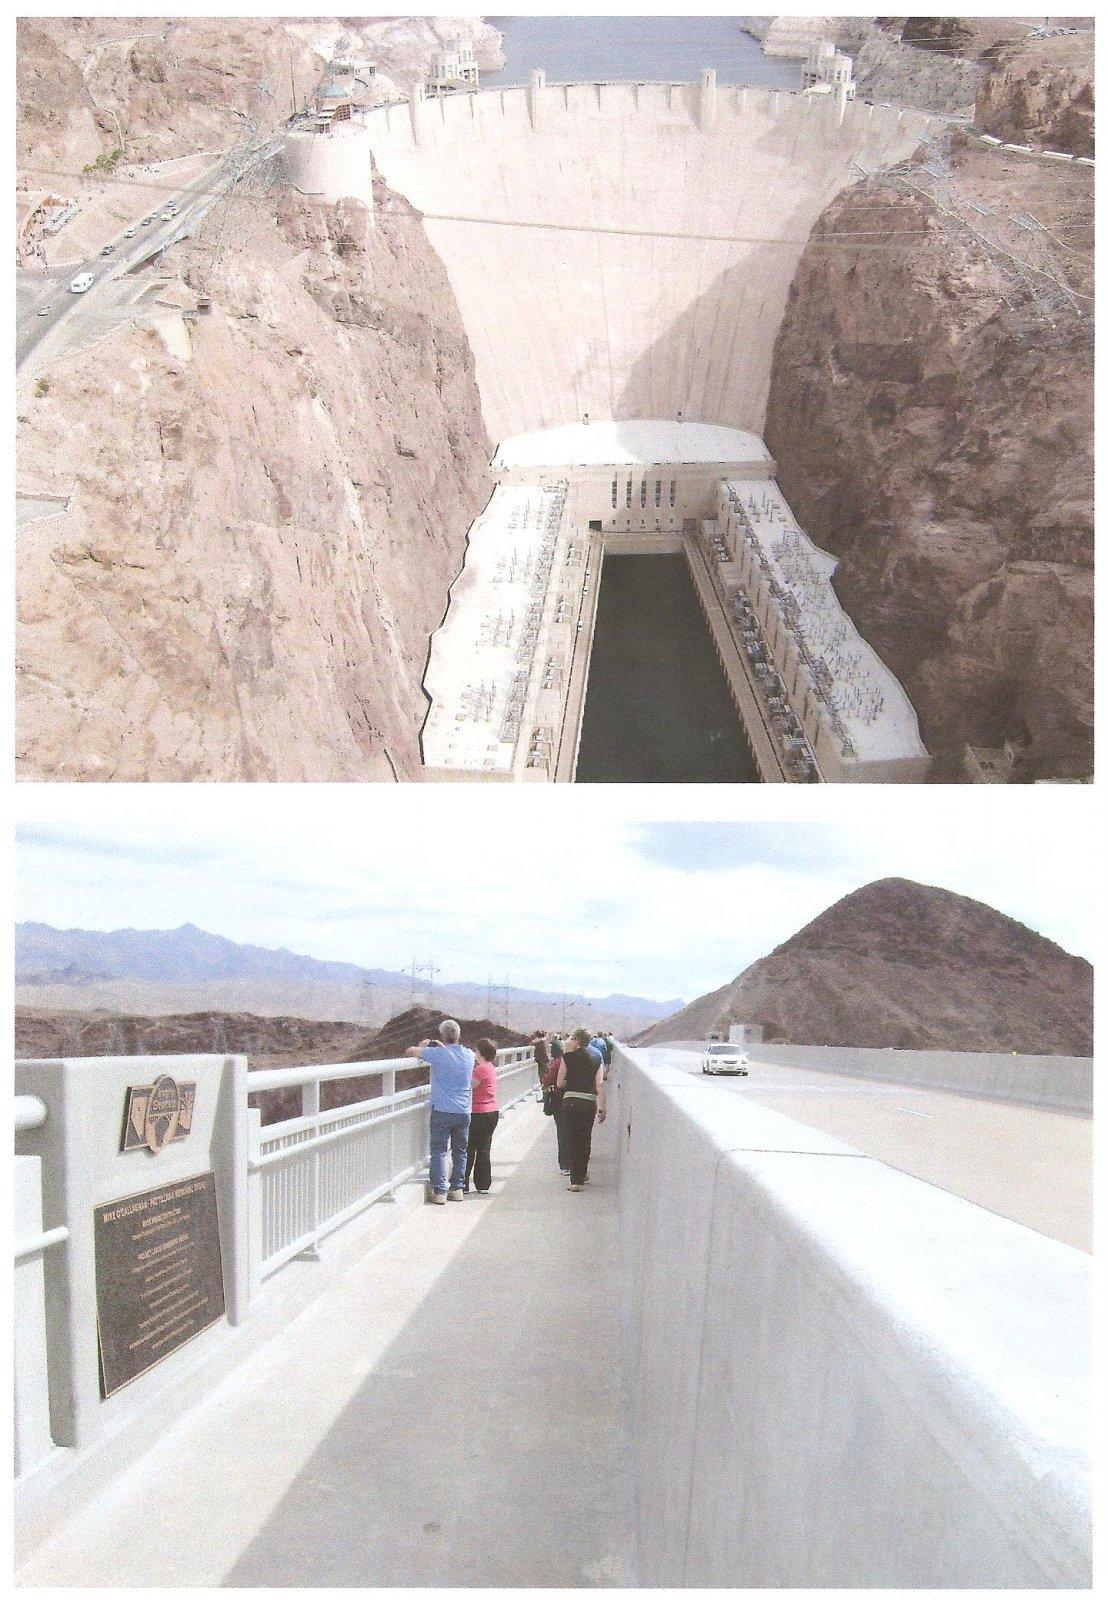 Click image for larger version  Name:dam & walkway om bridge.jpg Views:63 Size:391.4 KB ID:113918